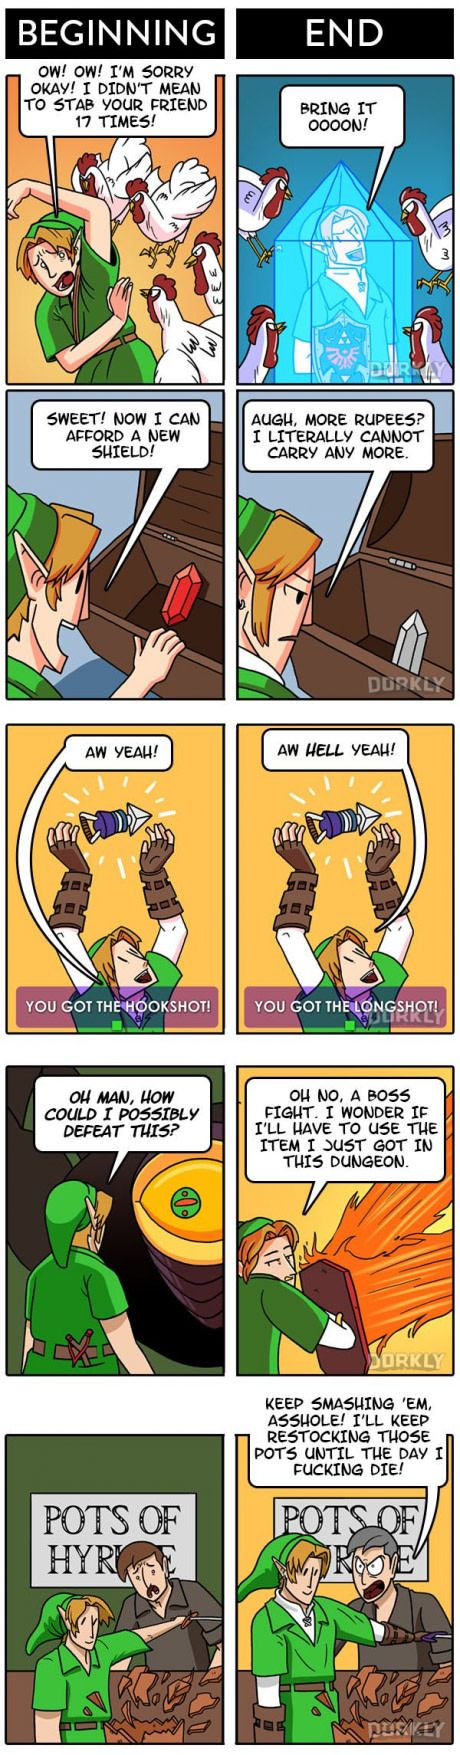 Legend of Zelda Games: Beginning VS End